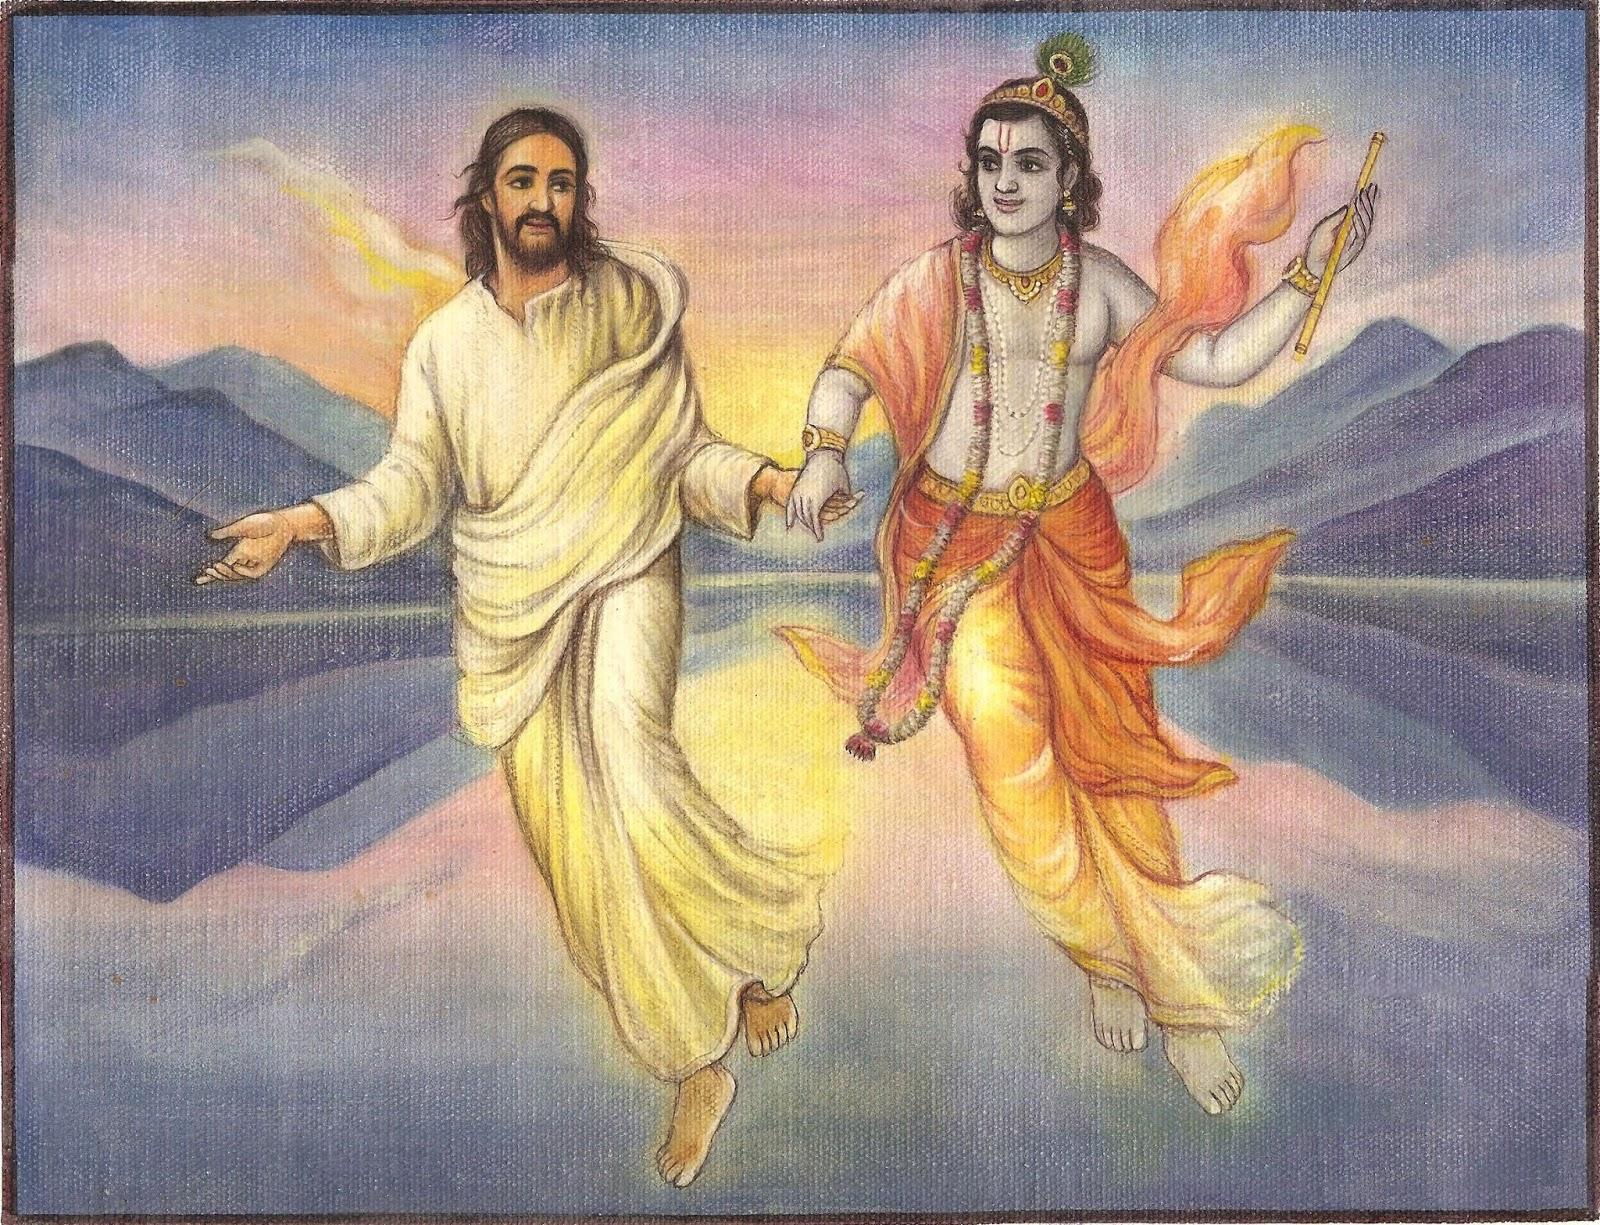 Hare Krishna Al Descubierto Cristo Y Krishna No Son Lo Mismo